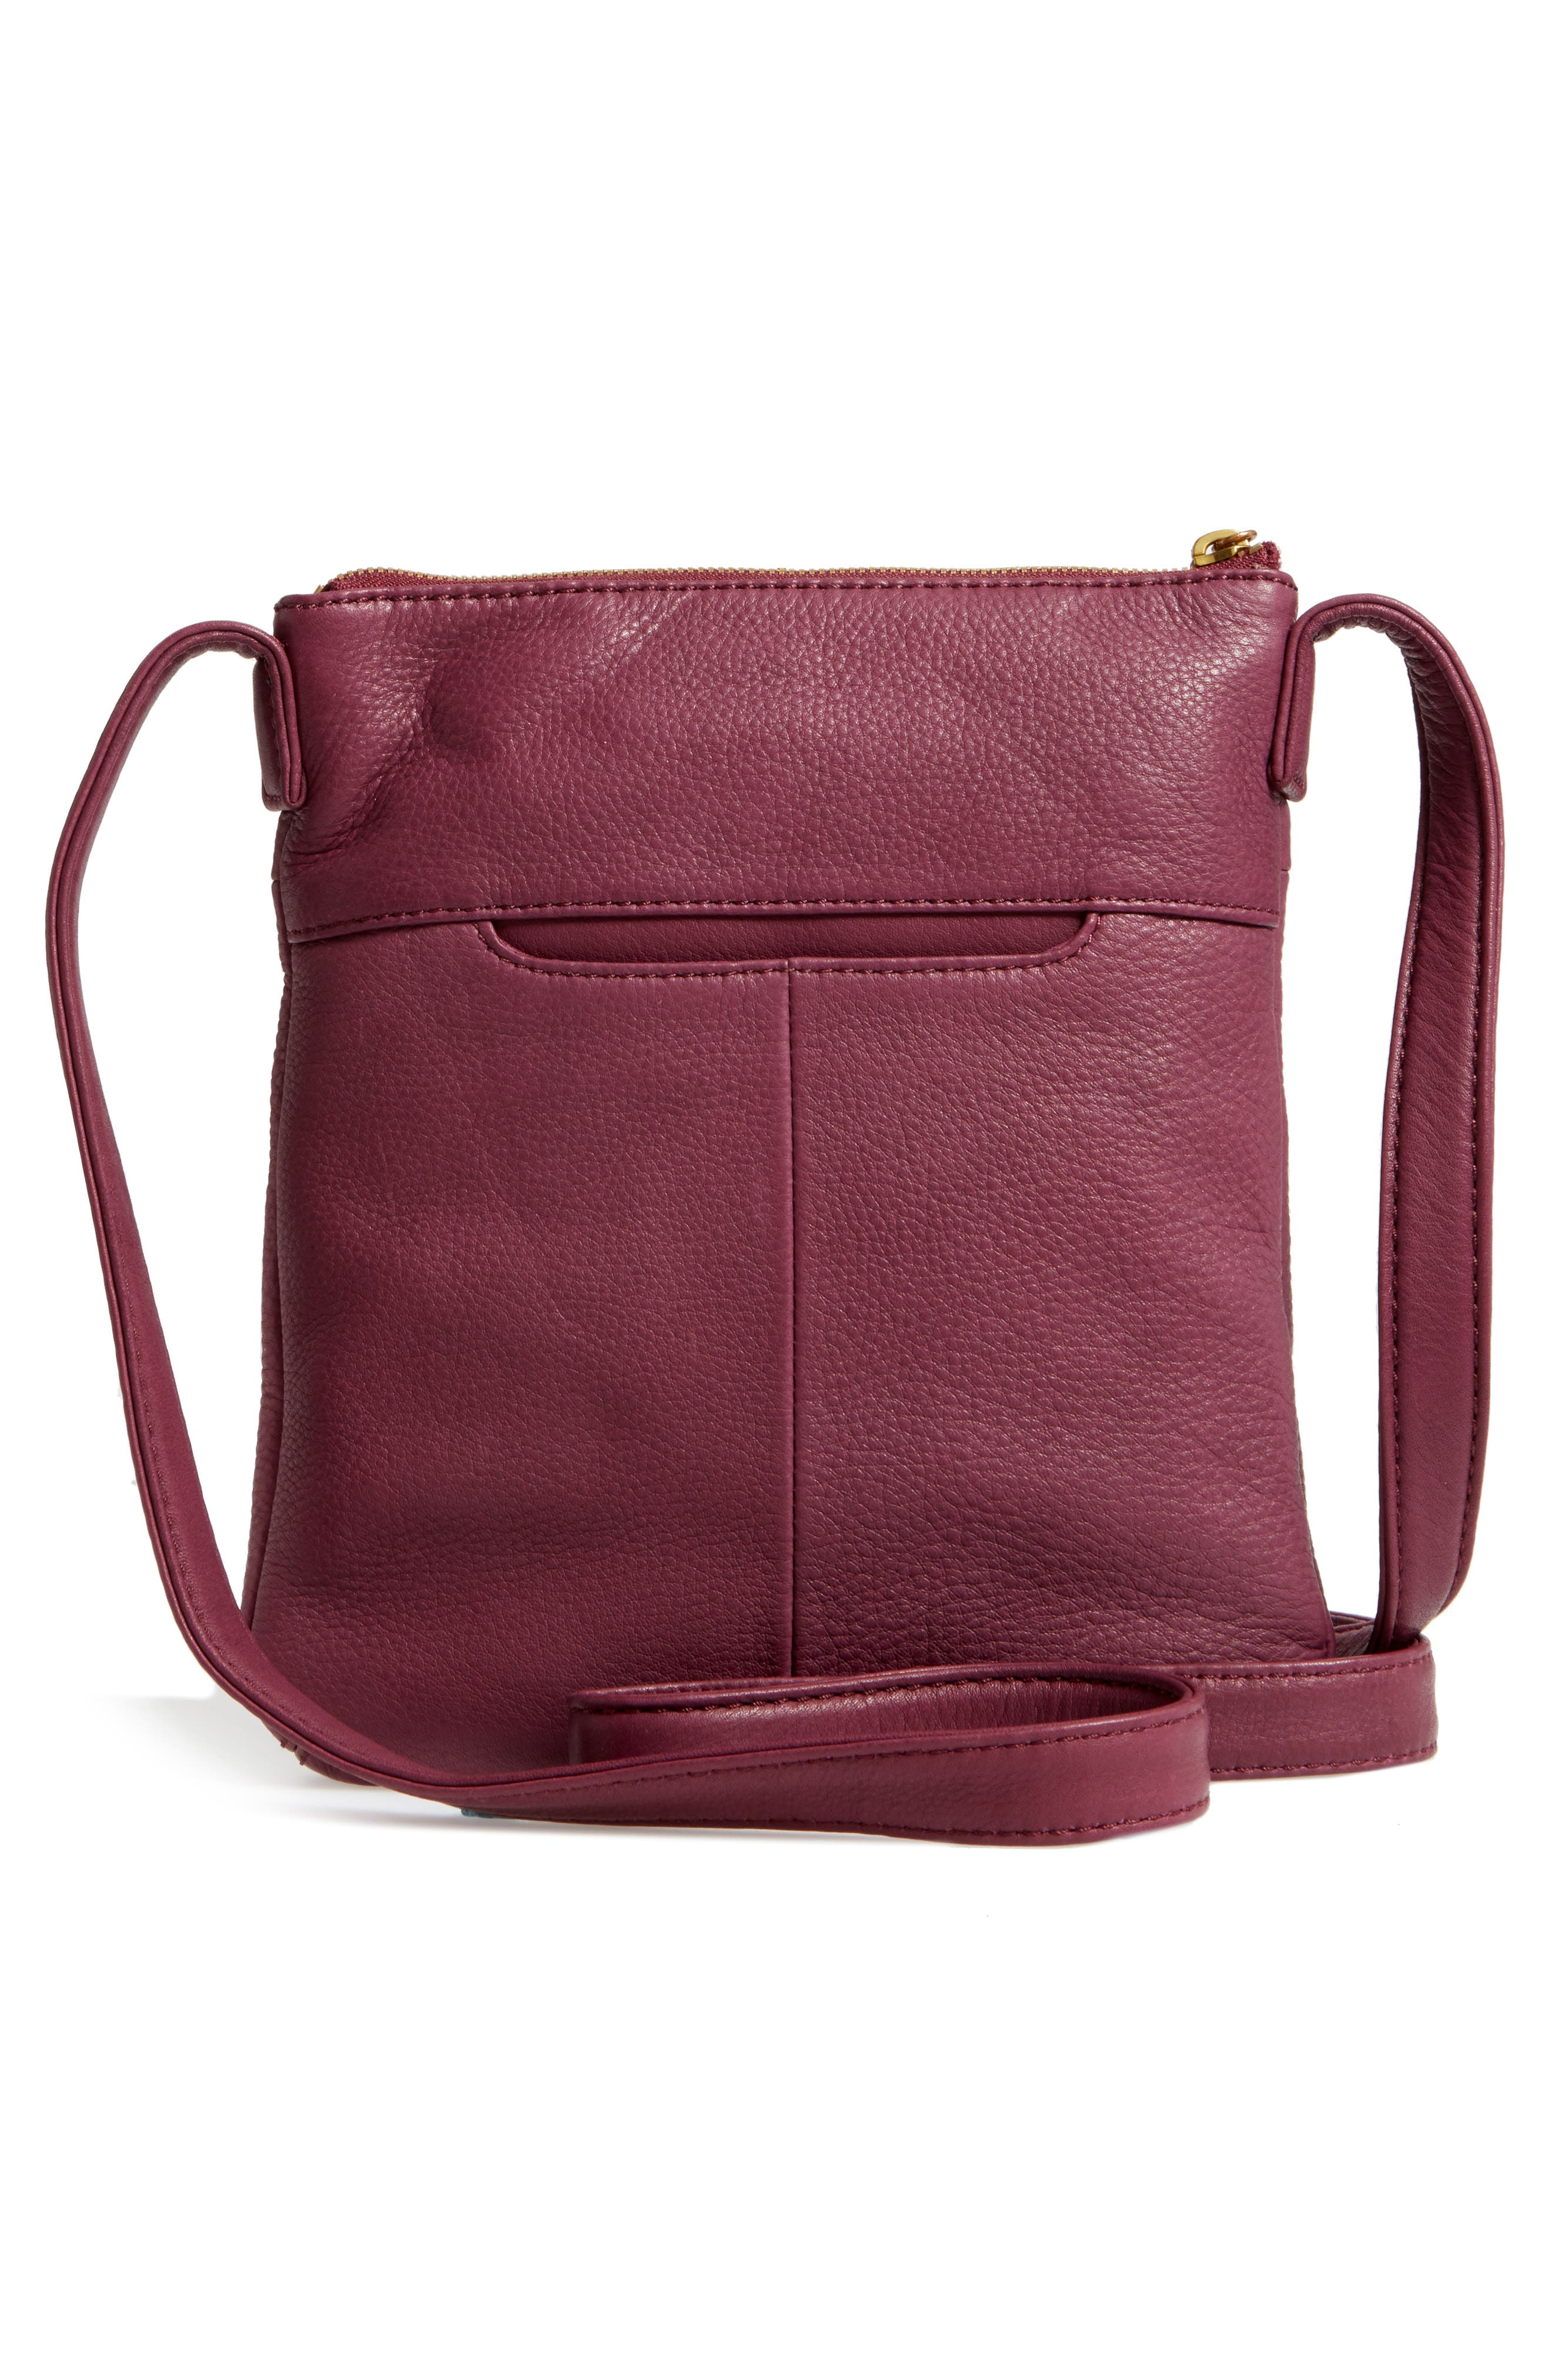 Alternate Image 2  - Hobo 'Sarah' Leather Crossbody Bag